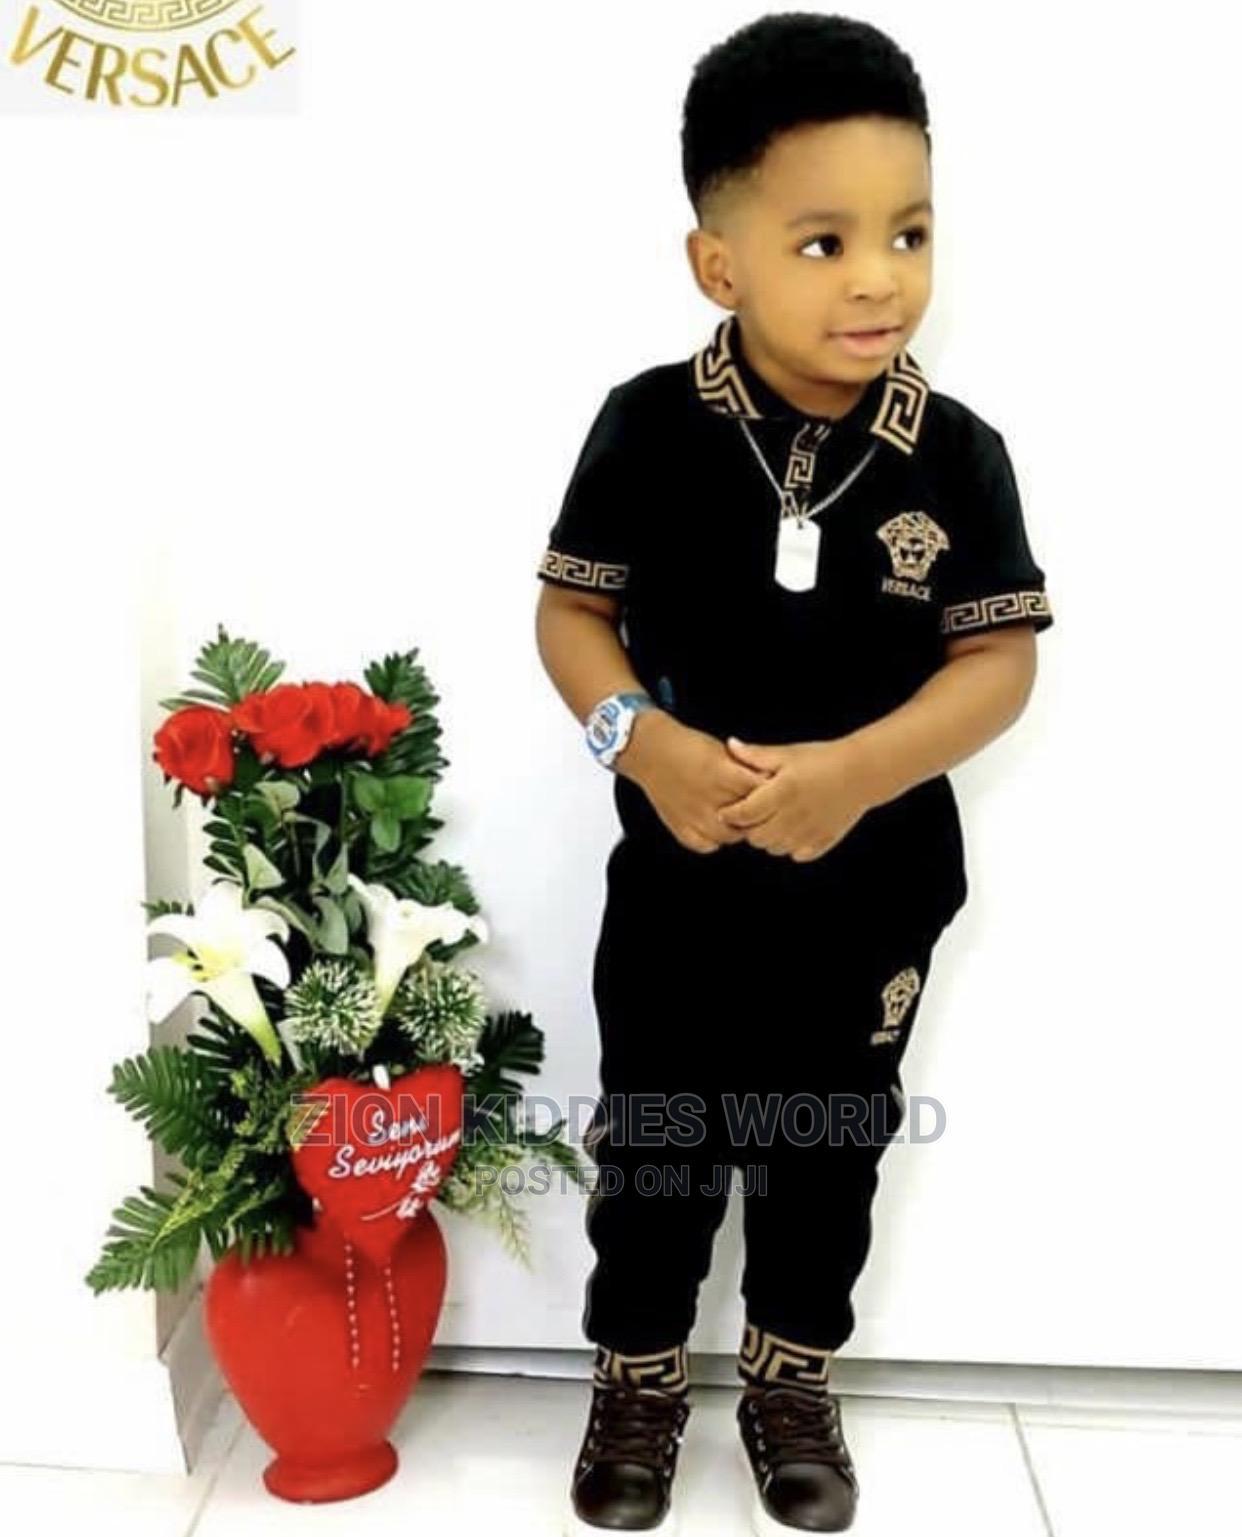 2pcs Versace for Boys